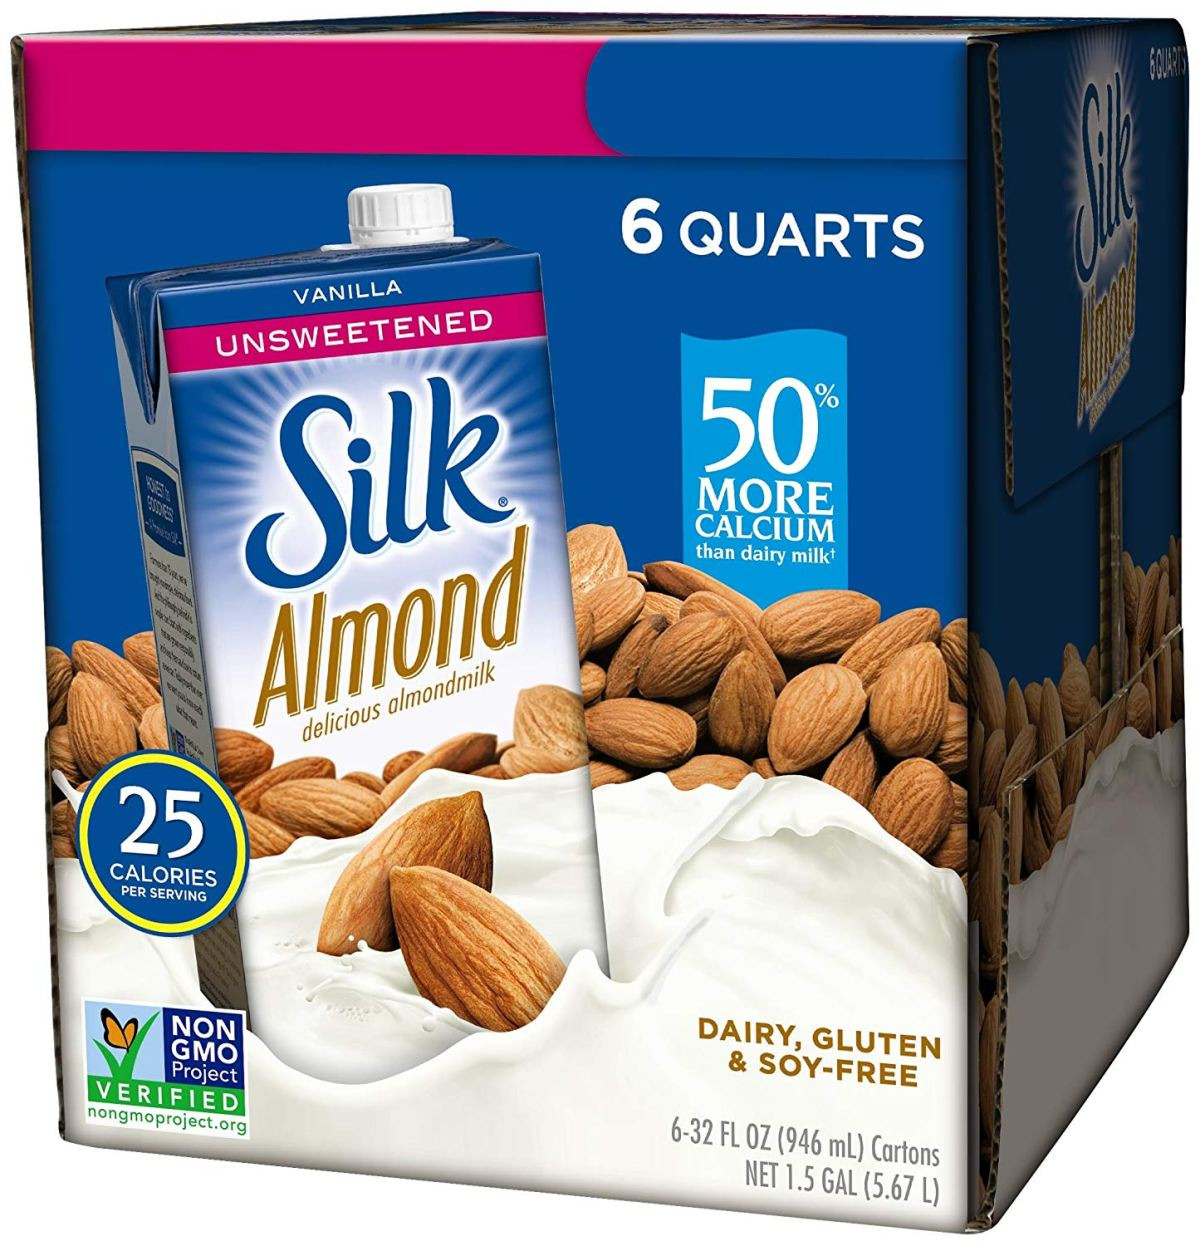 6-pack of Unsweetened Silk Almond Milk in box